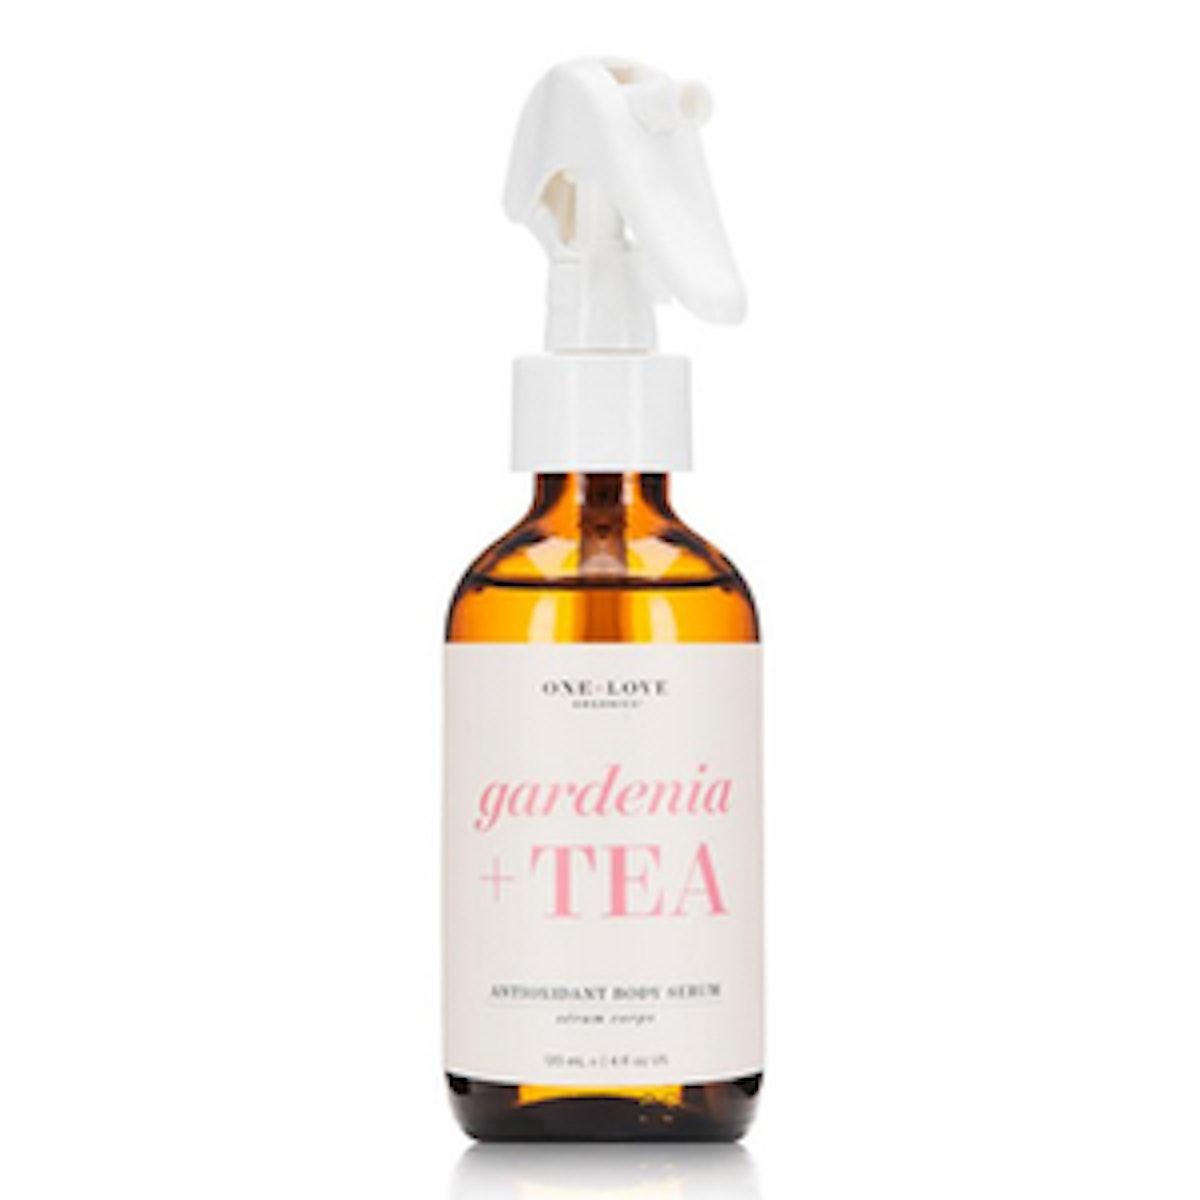 Gardenia and Tea Antioxidant Serum